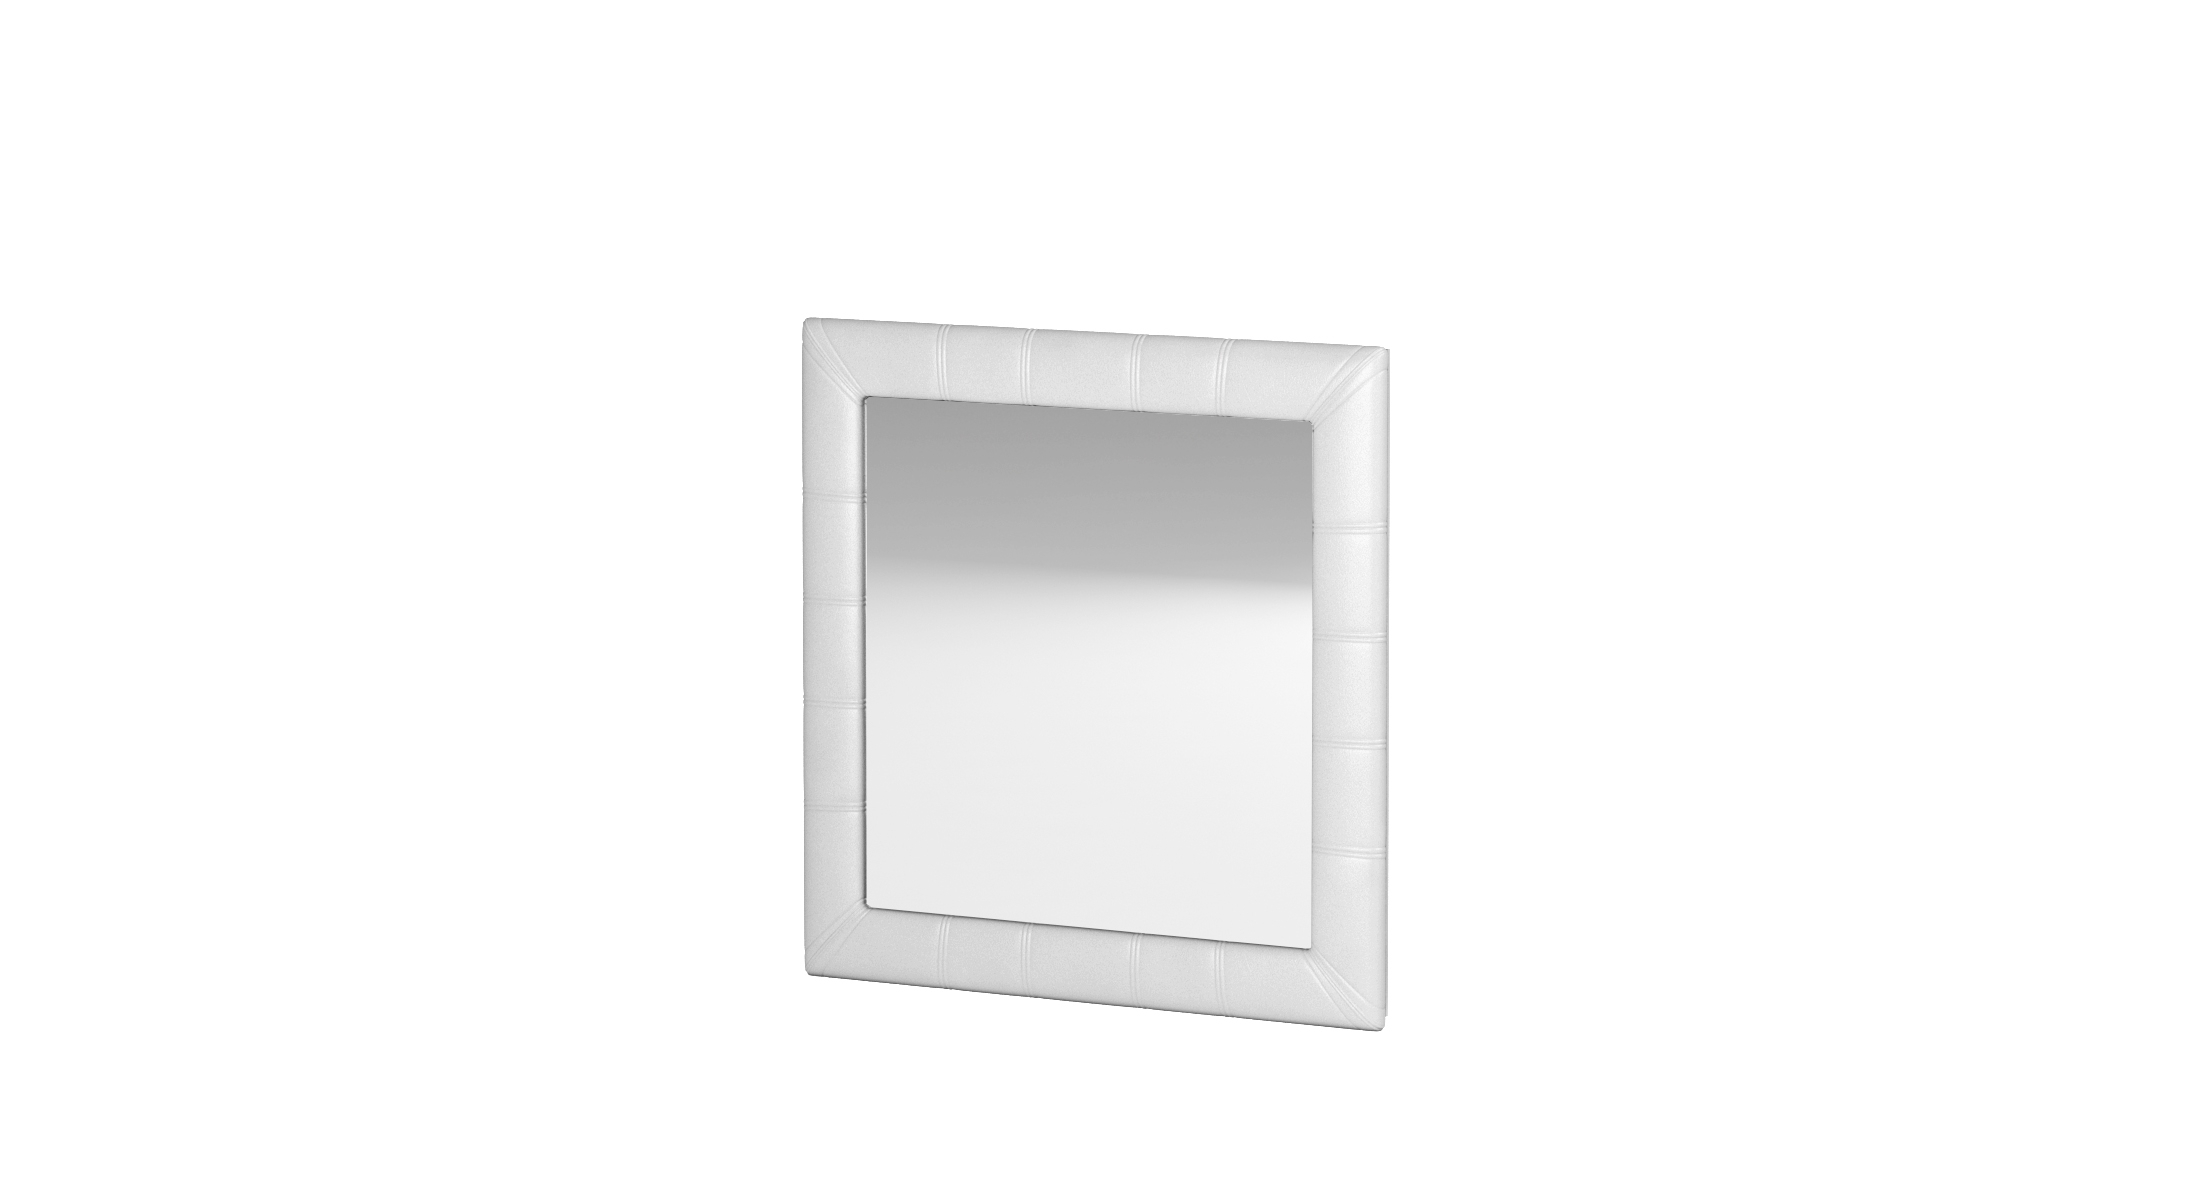 Зеркало Алеро квадратное мозаика Архитектория